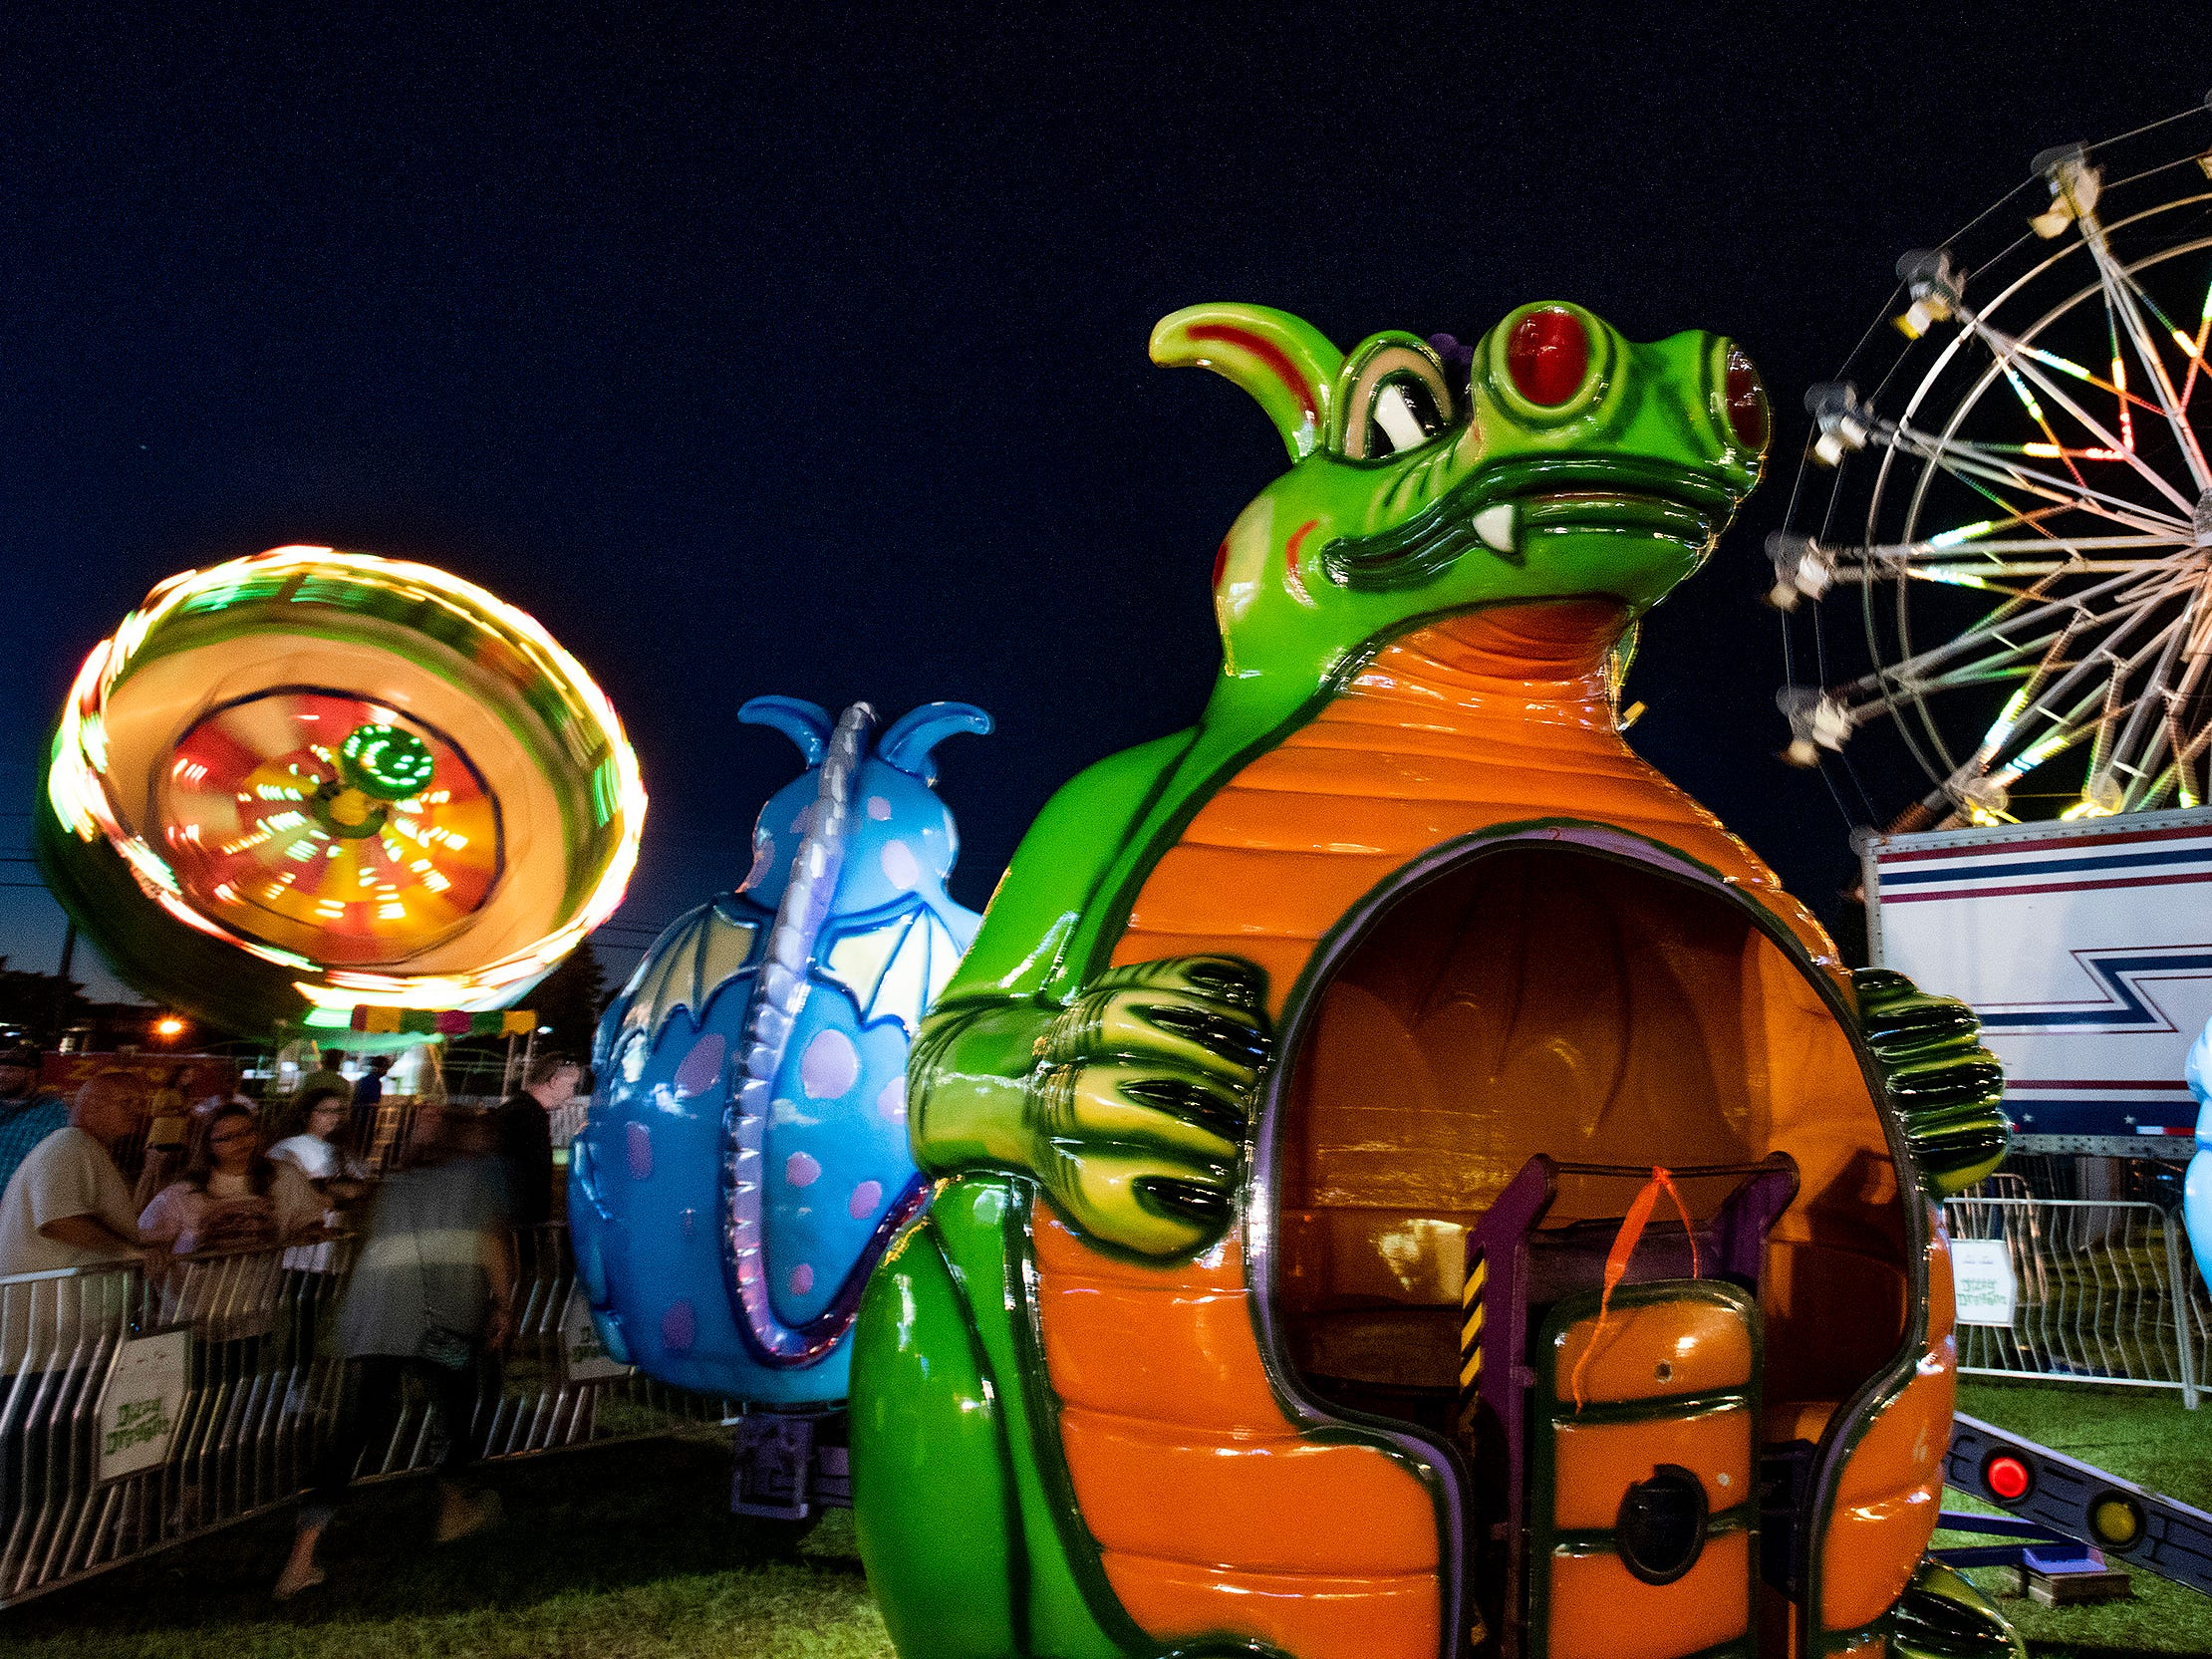 Families enjoy the Autauga County Fair in Prattville, Ala., on Thursday evening October 11, 2018. The fair runs through Saturday the 13th.